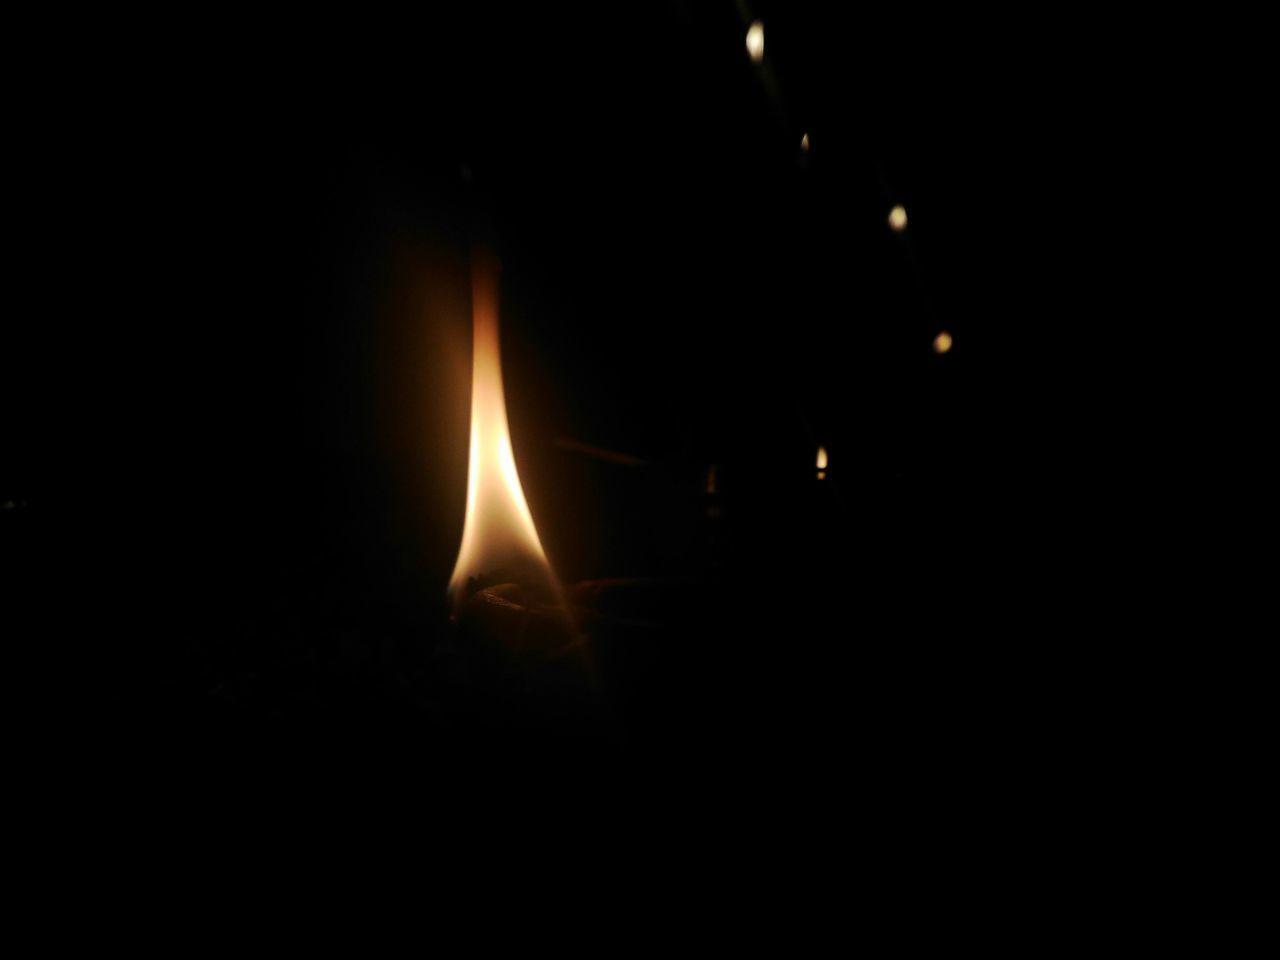 flame, burning, night, heat - temperature, close-up, illuminated, no people, outdoors, diya - oil lamp, black background, nature, astronomy